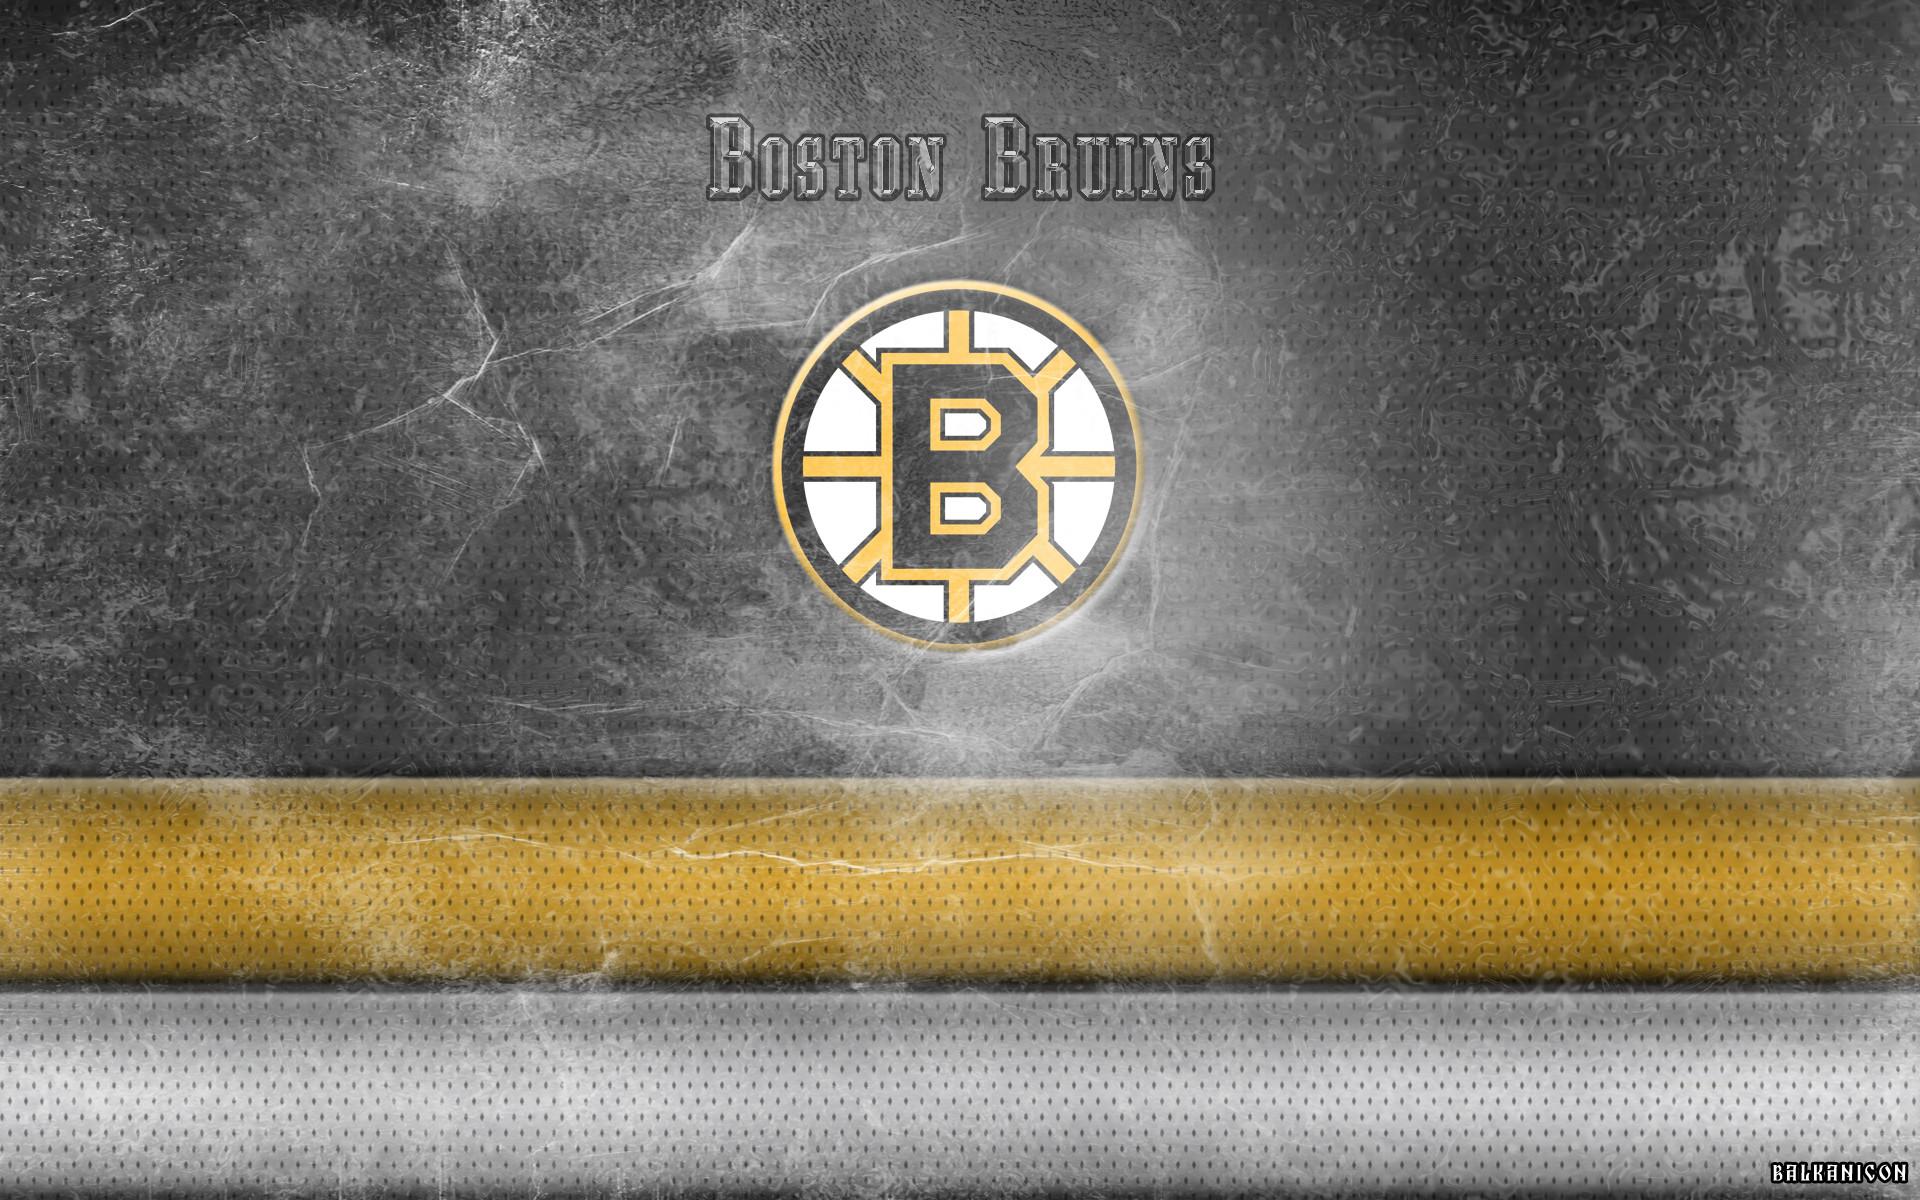 Res: 1920x1200, Boston Bruins wallpaper by Balkanicon Boston Bruins wallpaper by Balkanicon